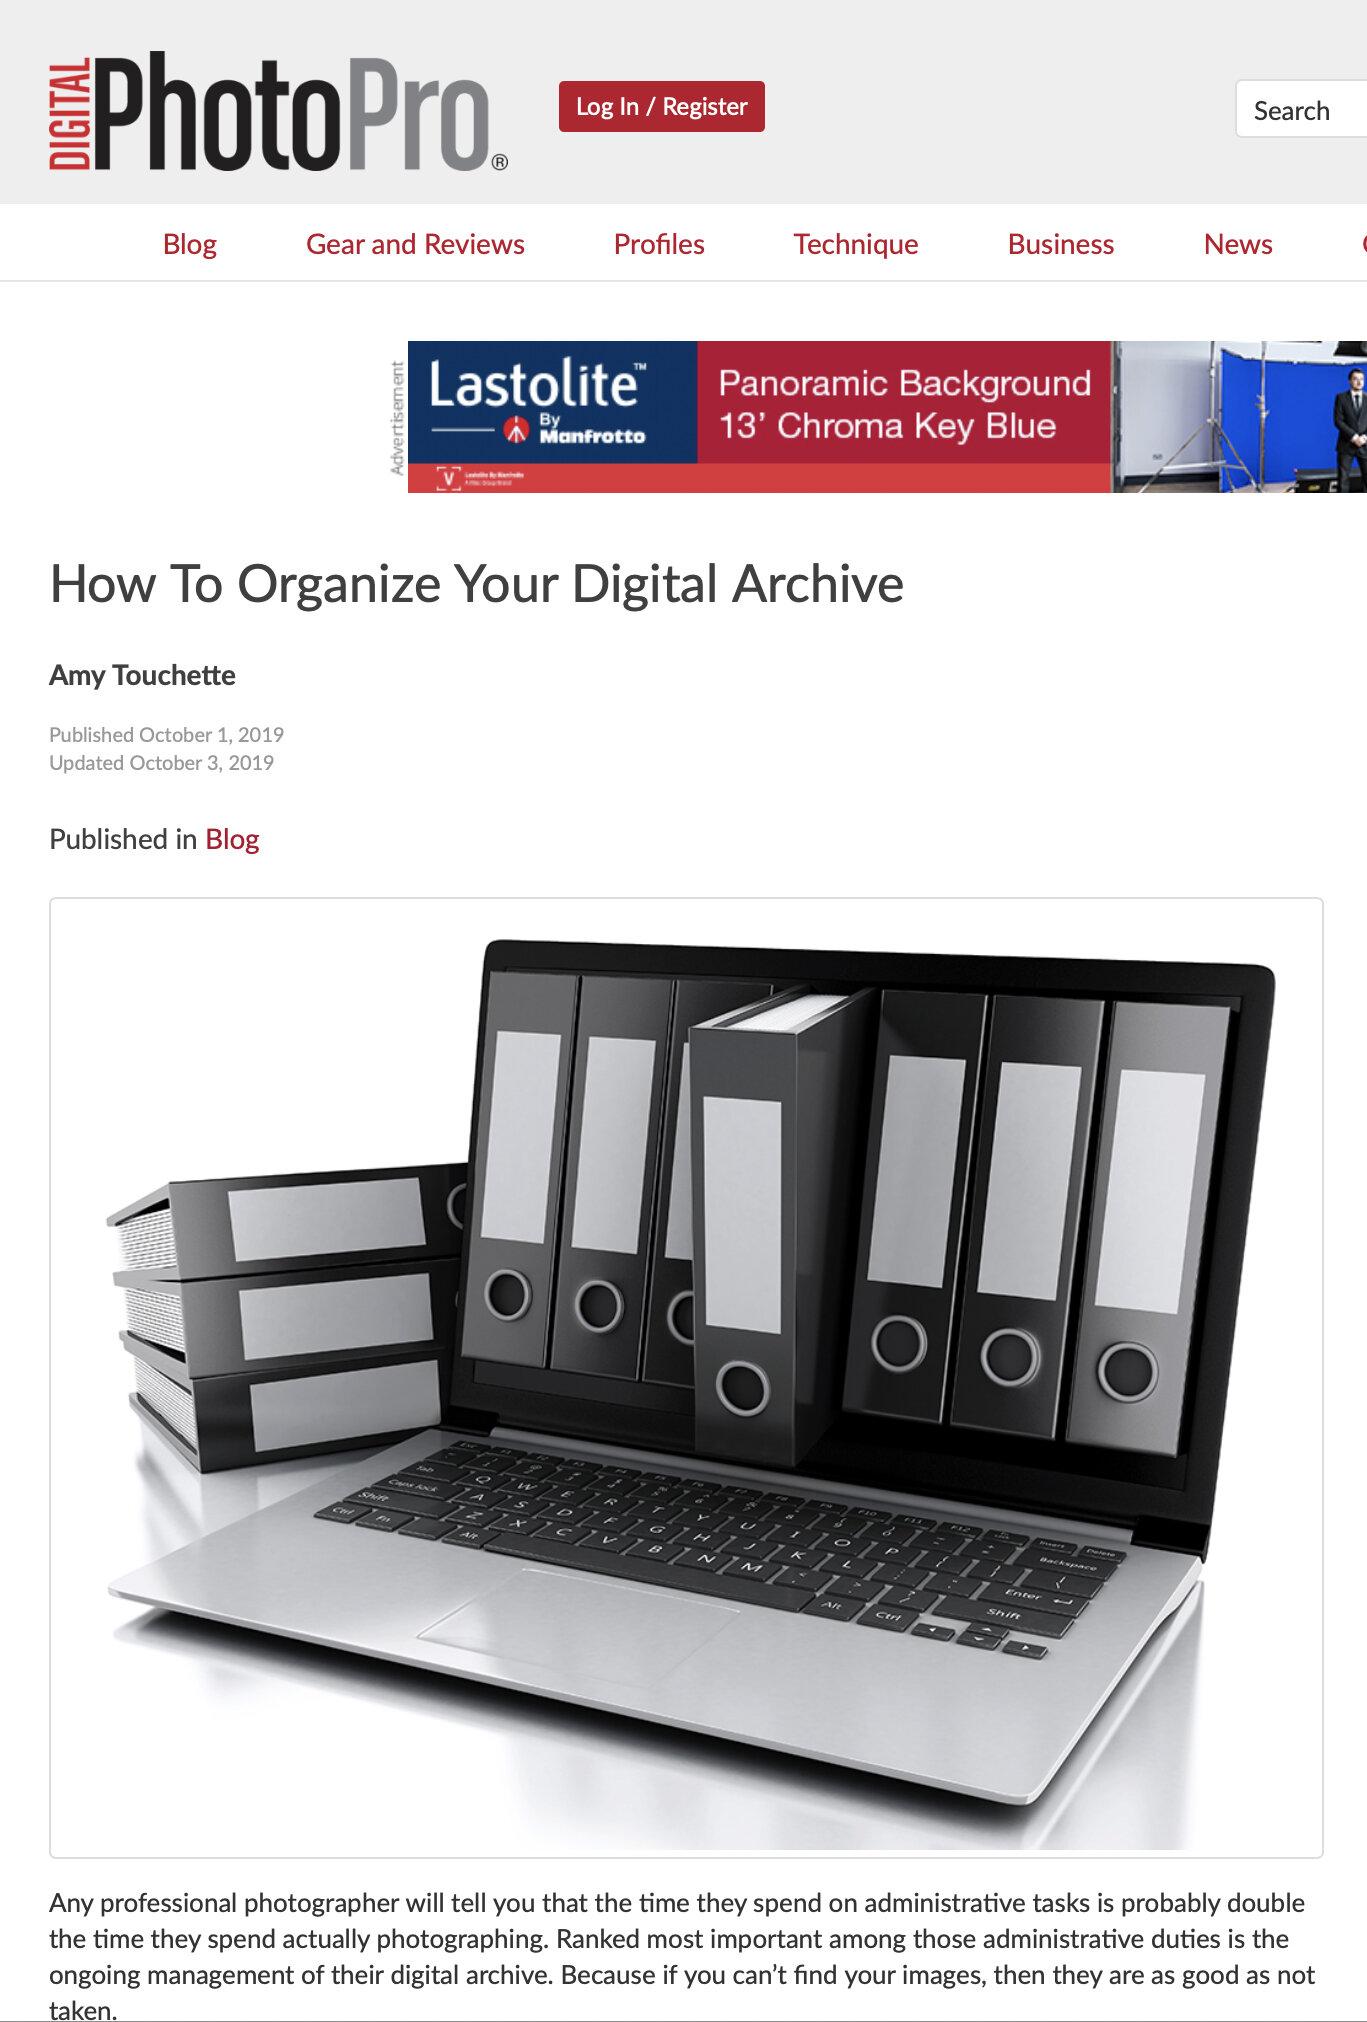 DPP Organizing Archive_10.03.19.jpg